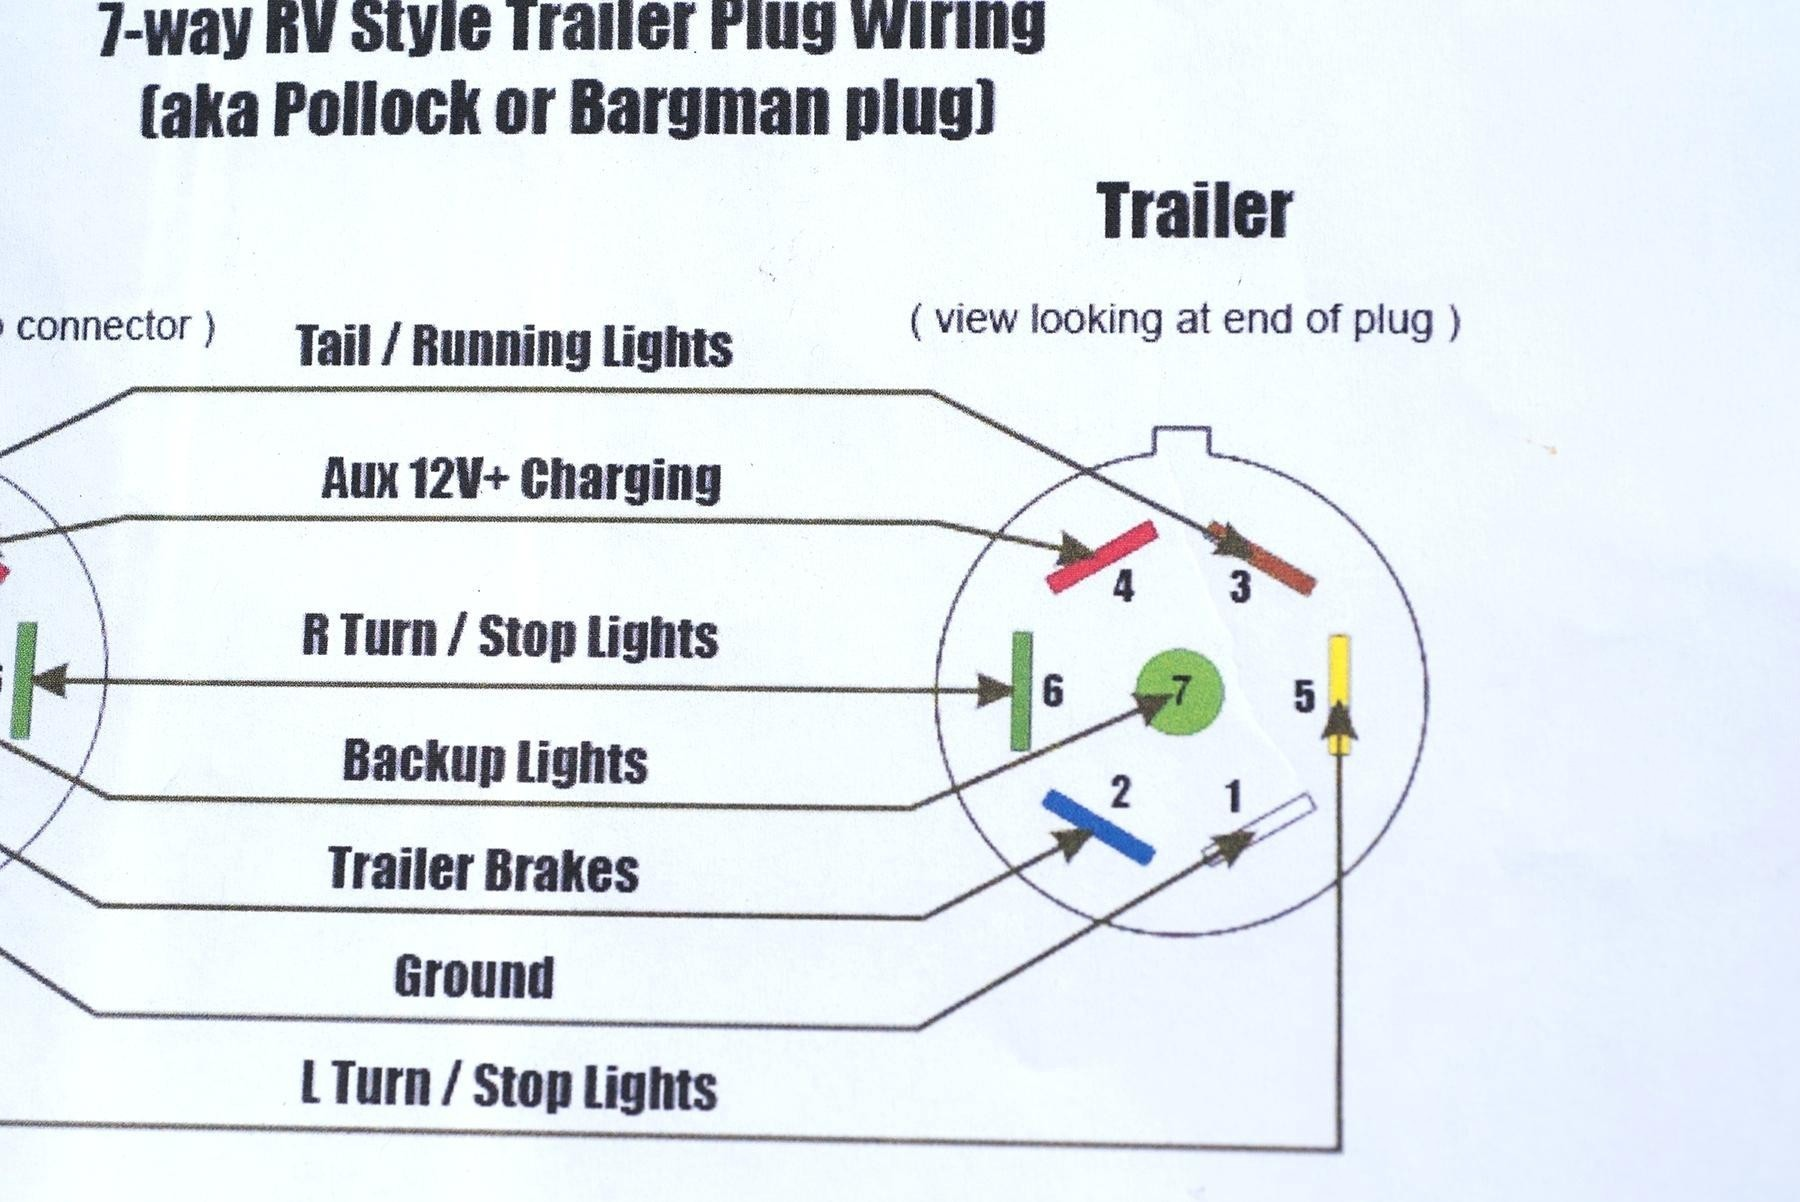 Trailer Light Wiring Diagram 7 Way 6 Round Adapter Plug Wire Diagram Wiring Diagram toolbox Of Trailer Light Wiring Diagram 7 Way ford Alternator Wiring Harness